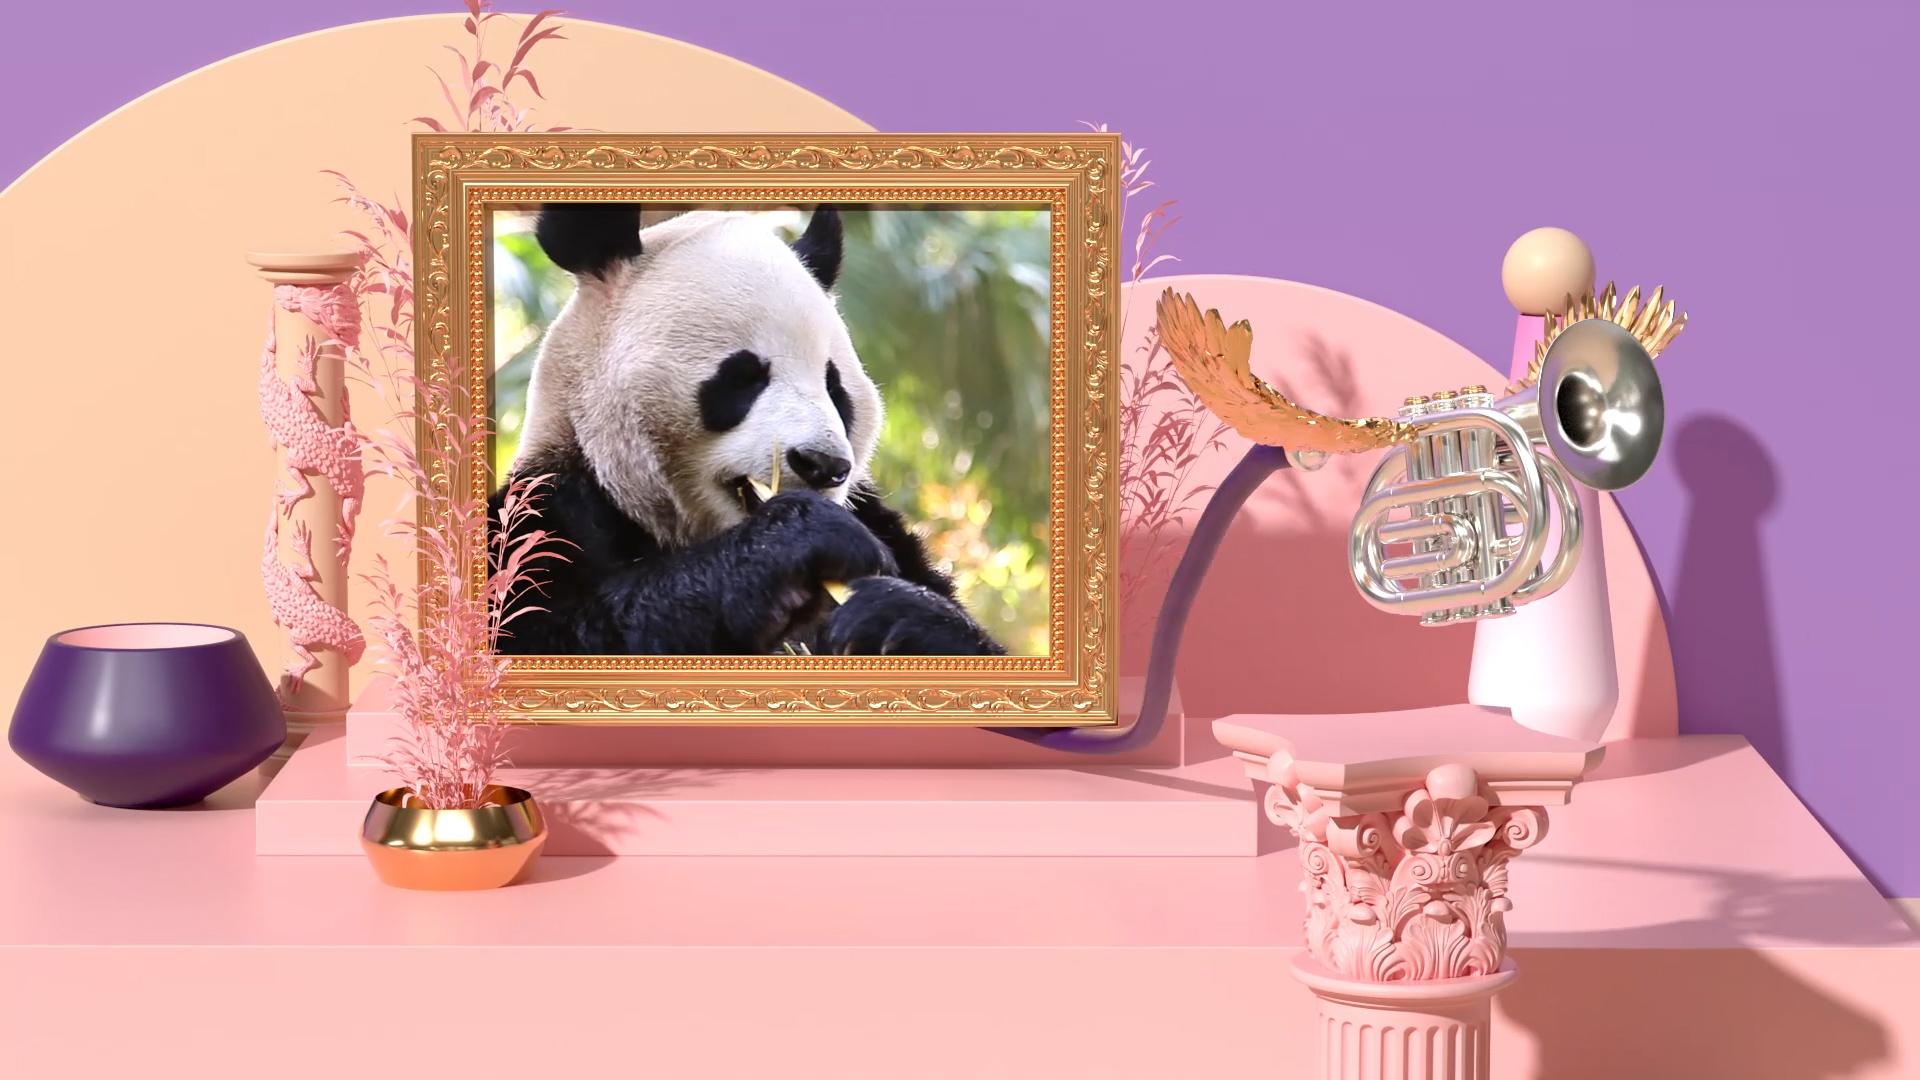 Wheyhey_02_Panda_1920x1080_25fps_h264.63.Still002.jpg